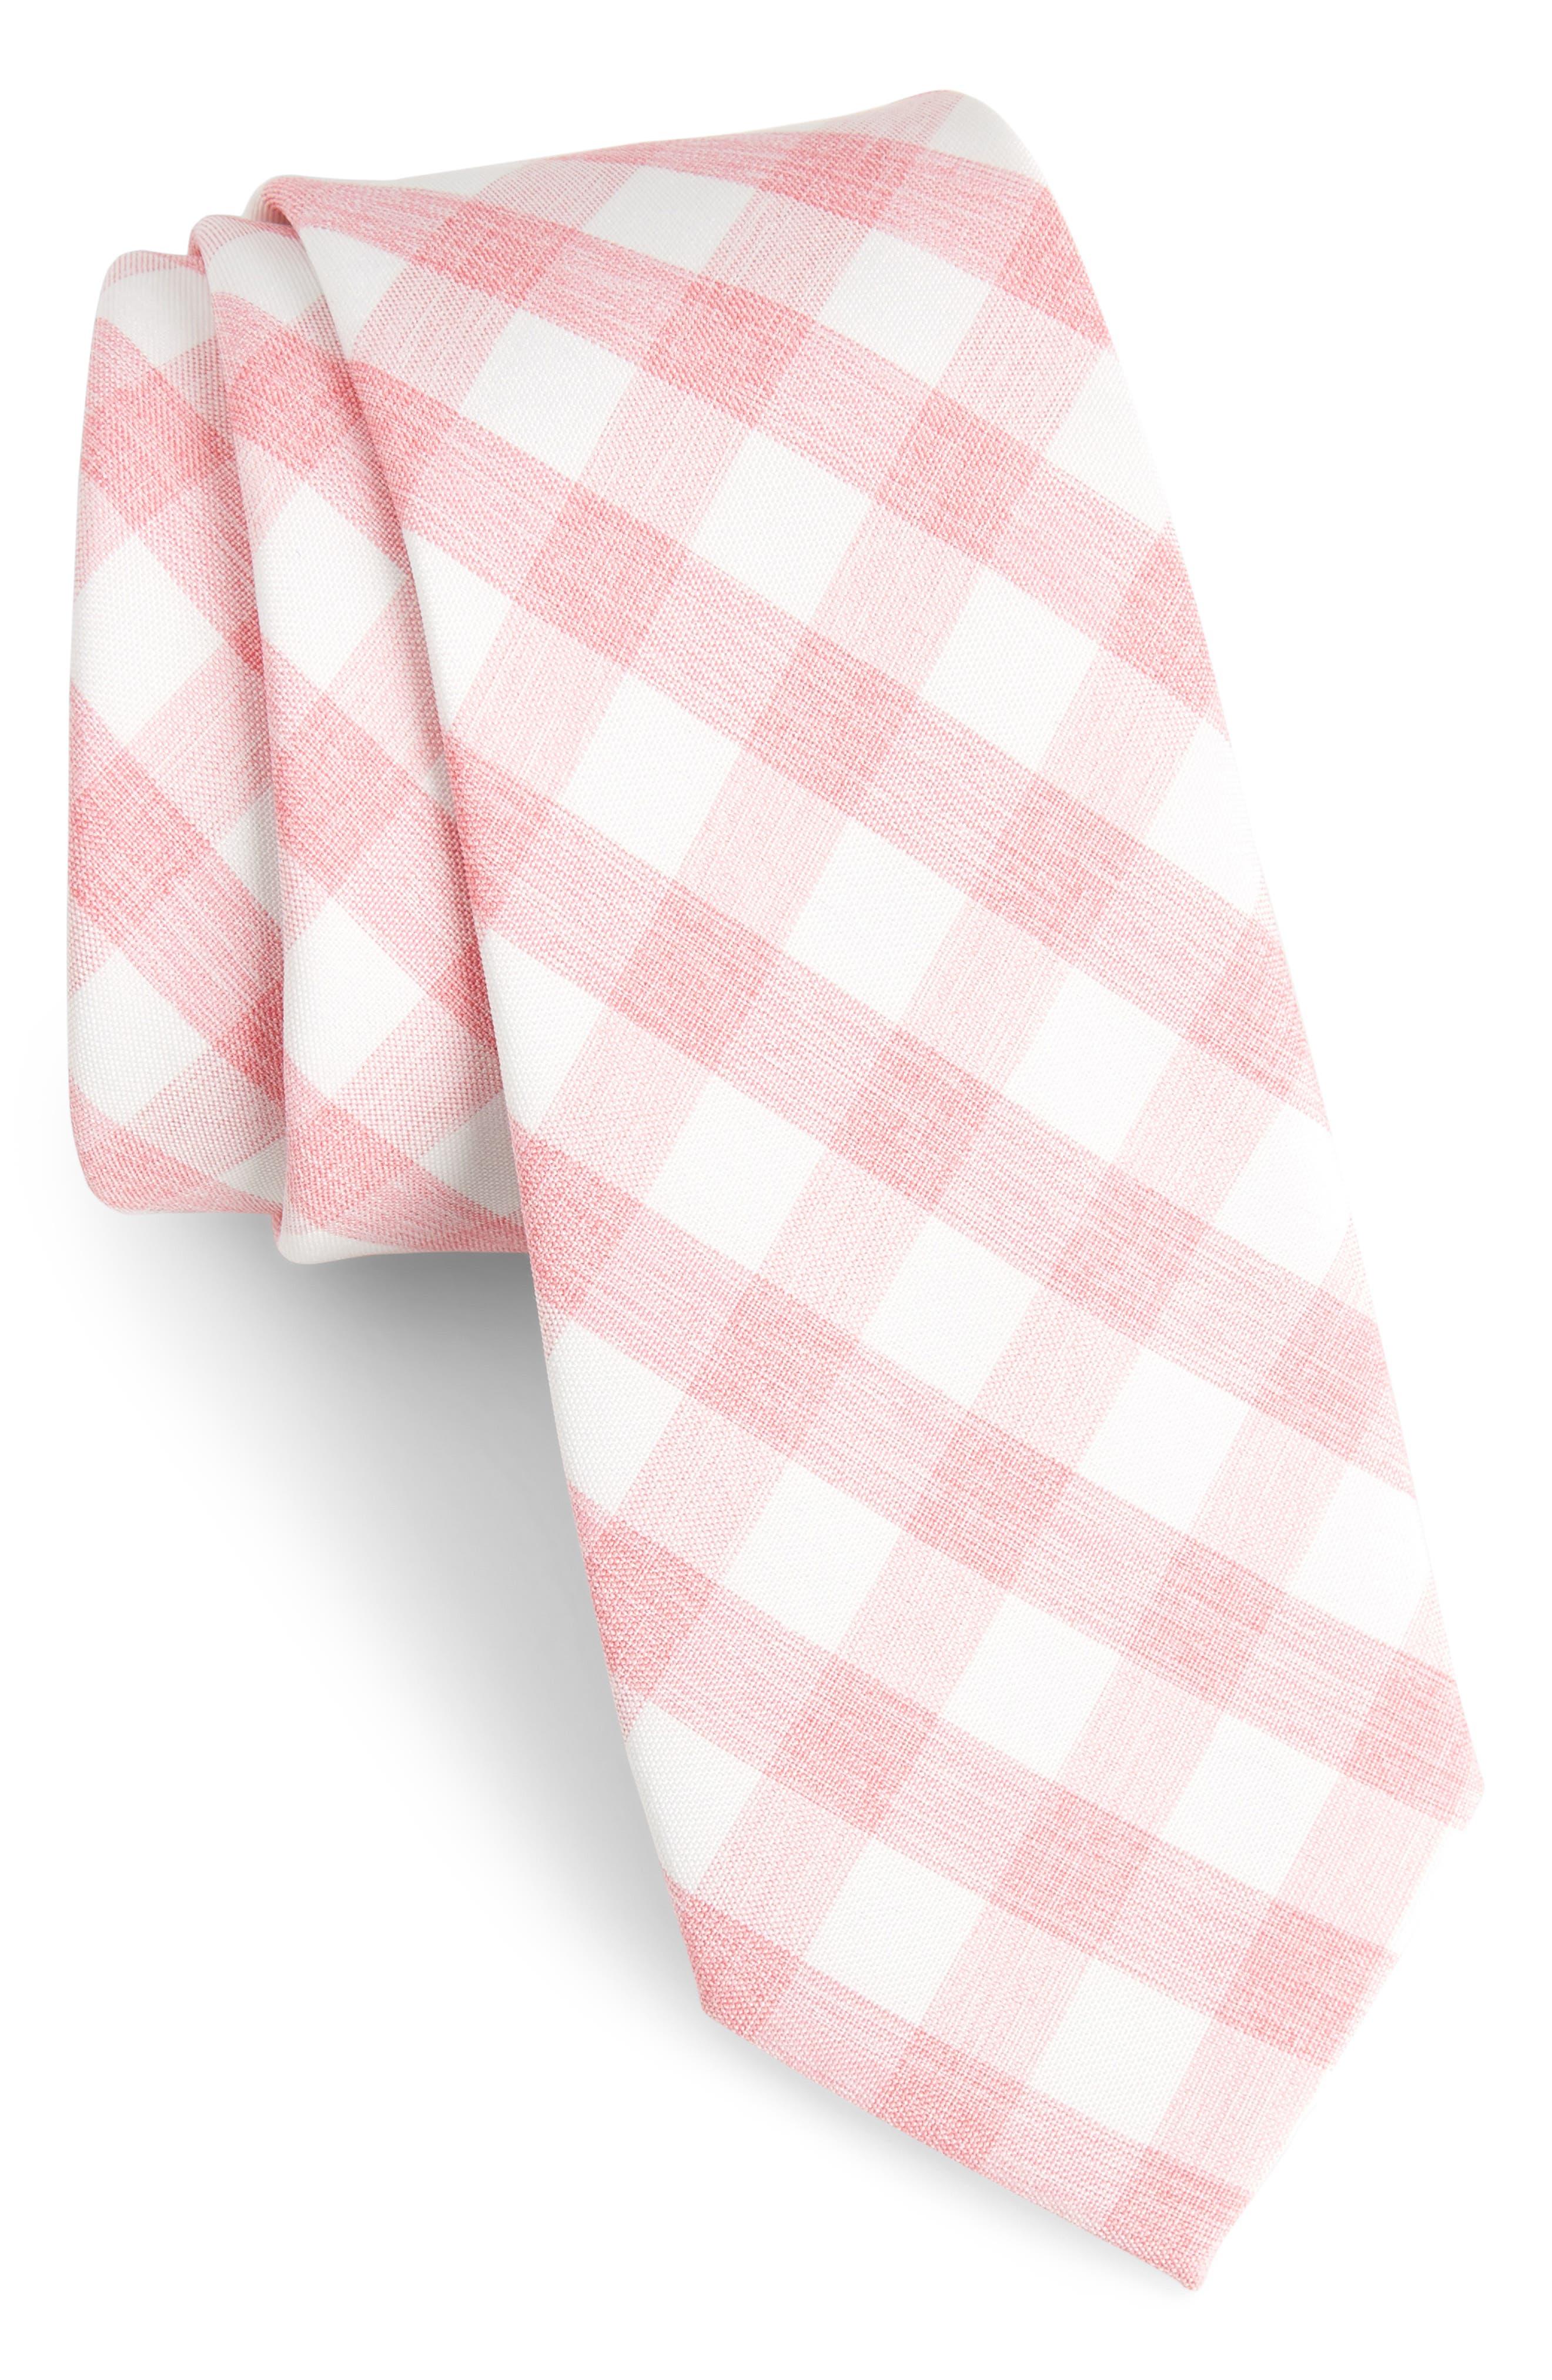 Larkin Check Cotton Tie,                         Main,                         color, Pink